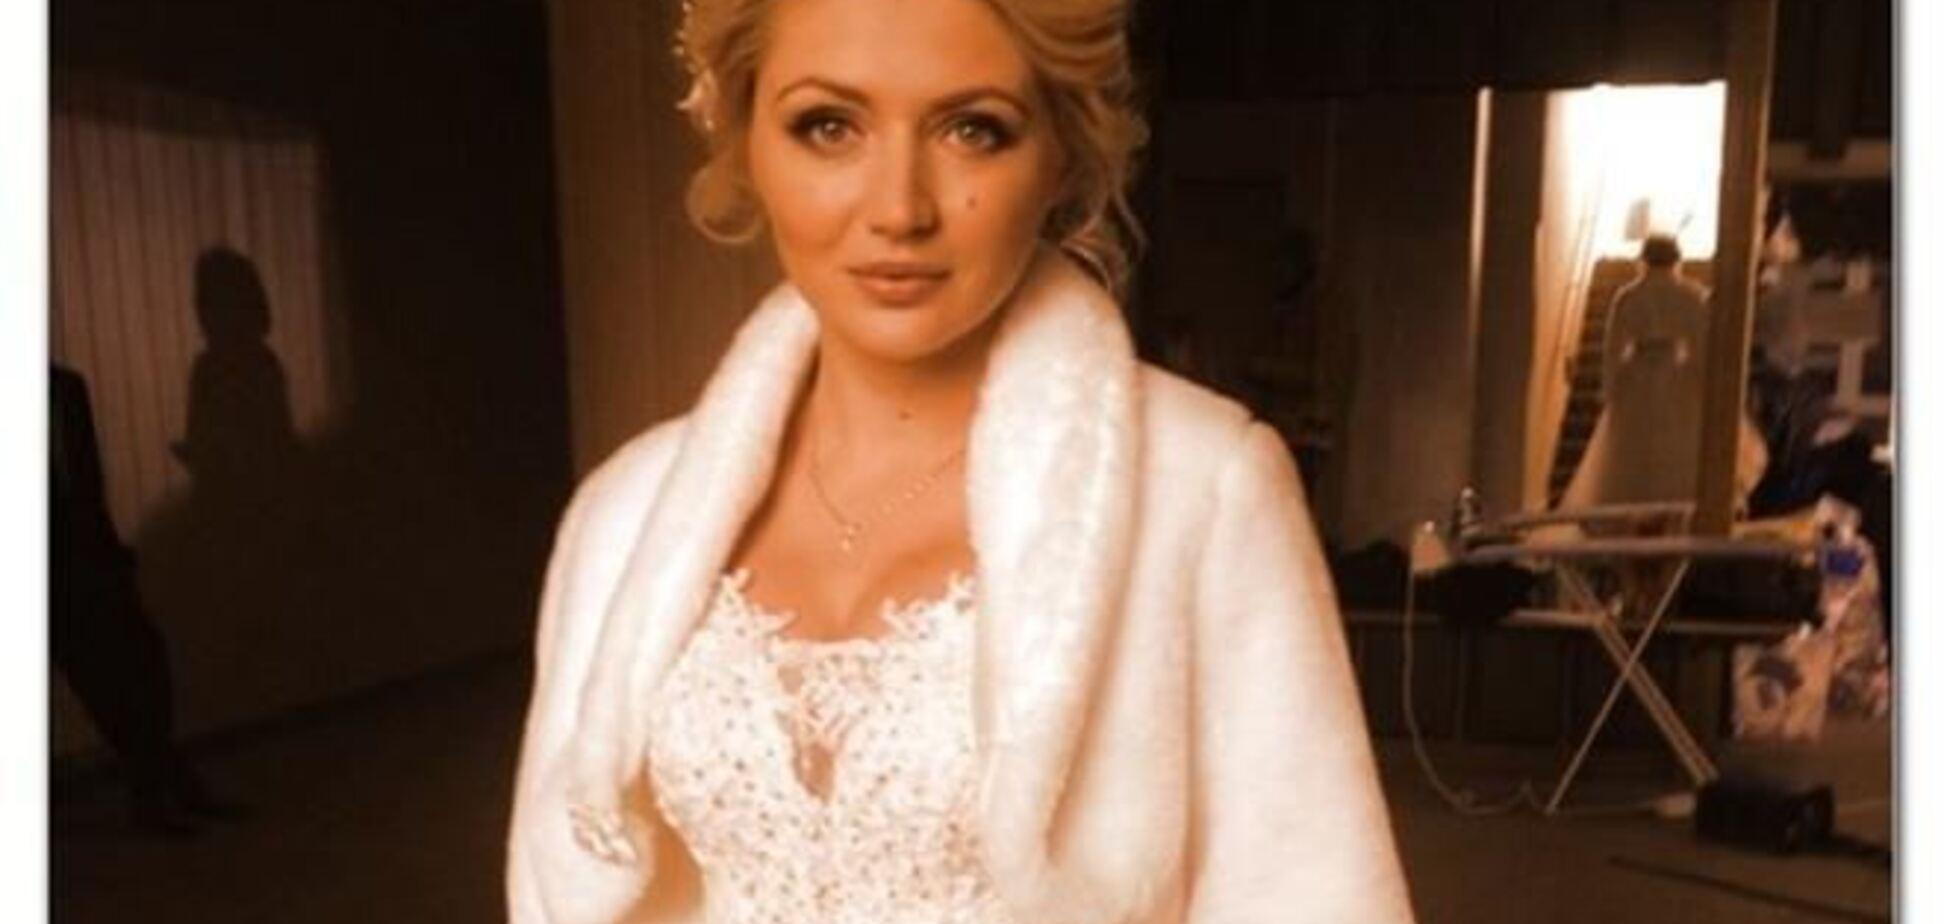 Ведуча 'Педан-Притула Шоу' 7 раз побувала замужем